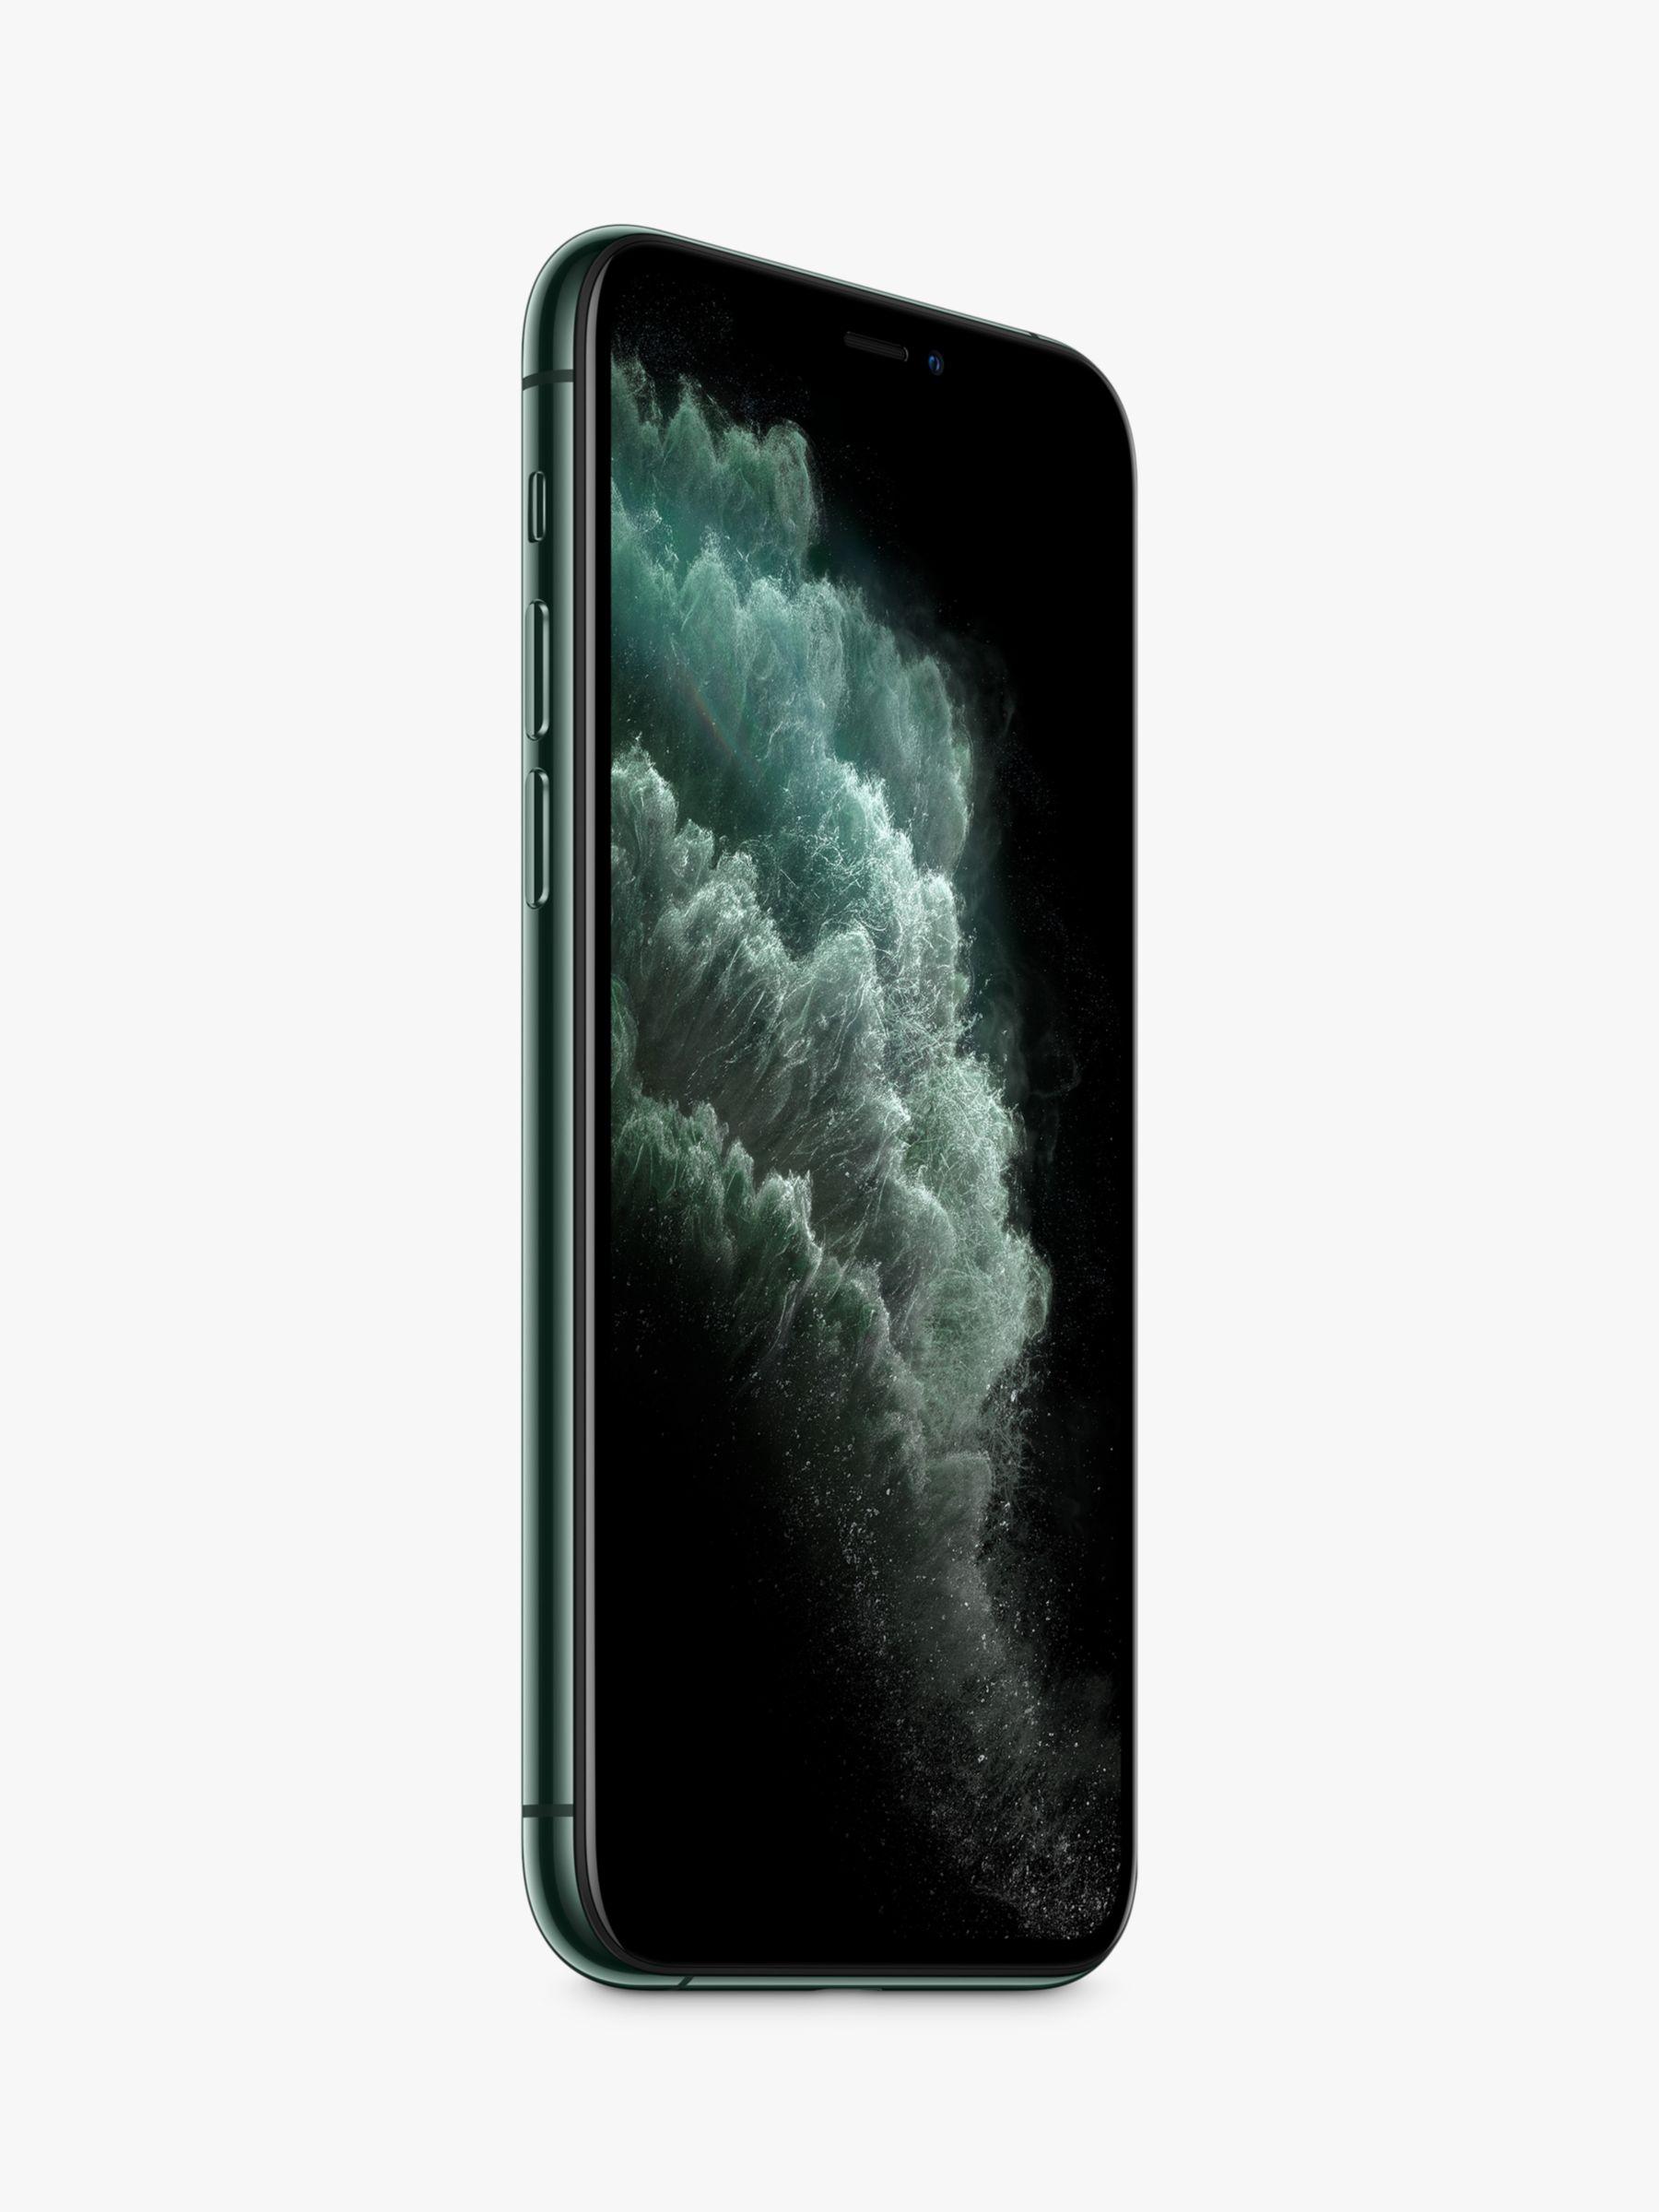 Apple Iphone 11 Pro Ios 5 8 4g Lte Sim Free 256gb At John Lewis Partners